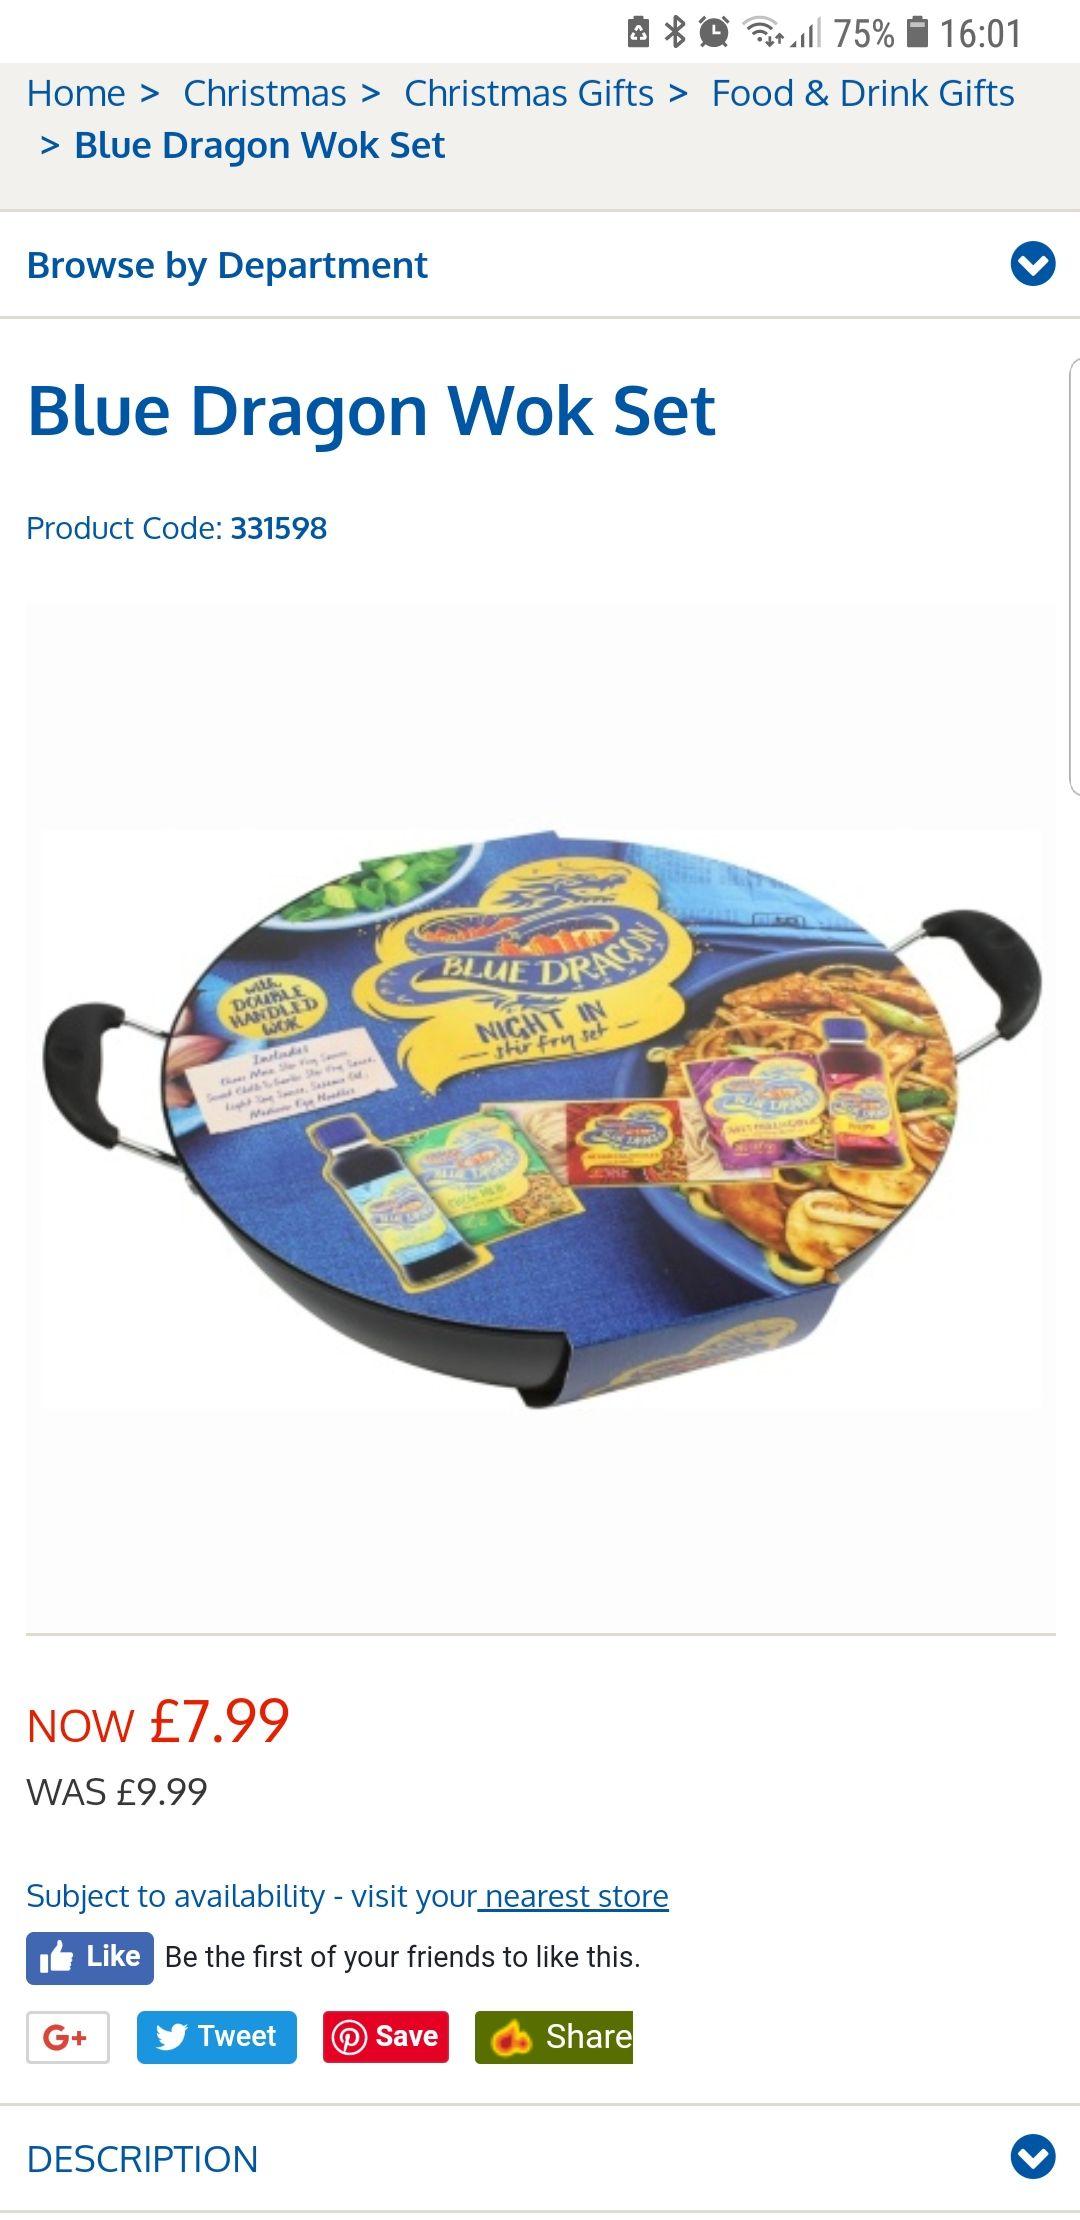 blue dragon wok B&M Bargains - £7.99